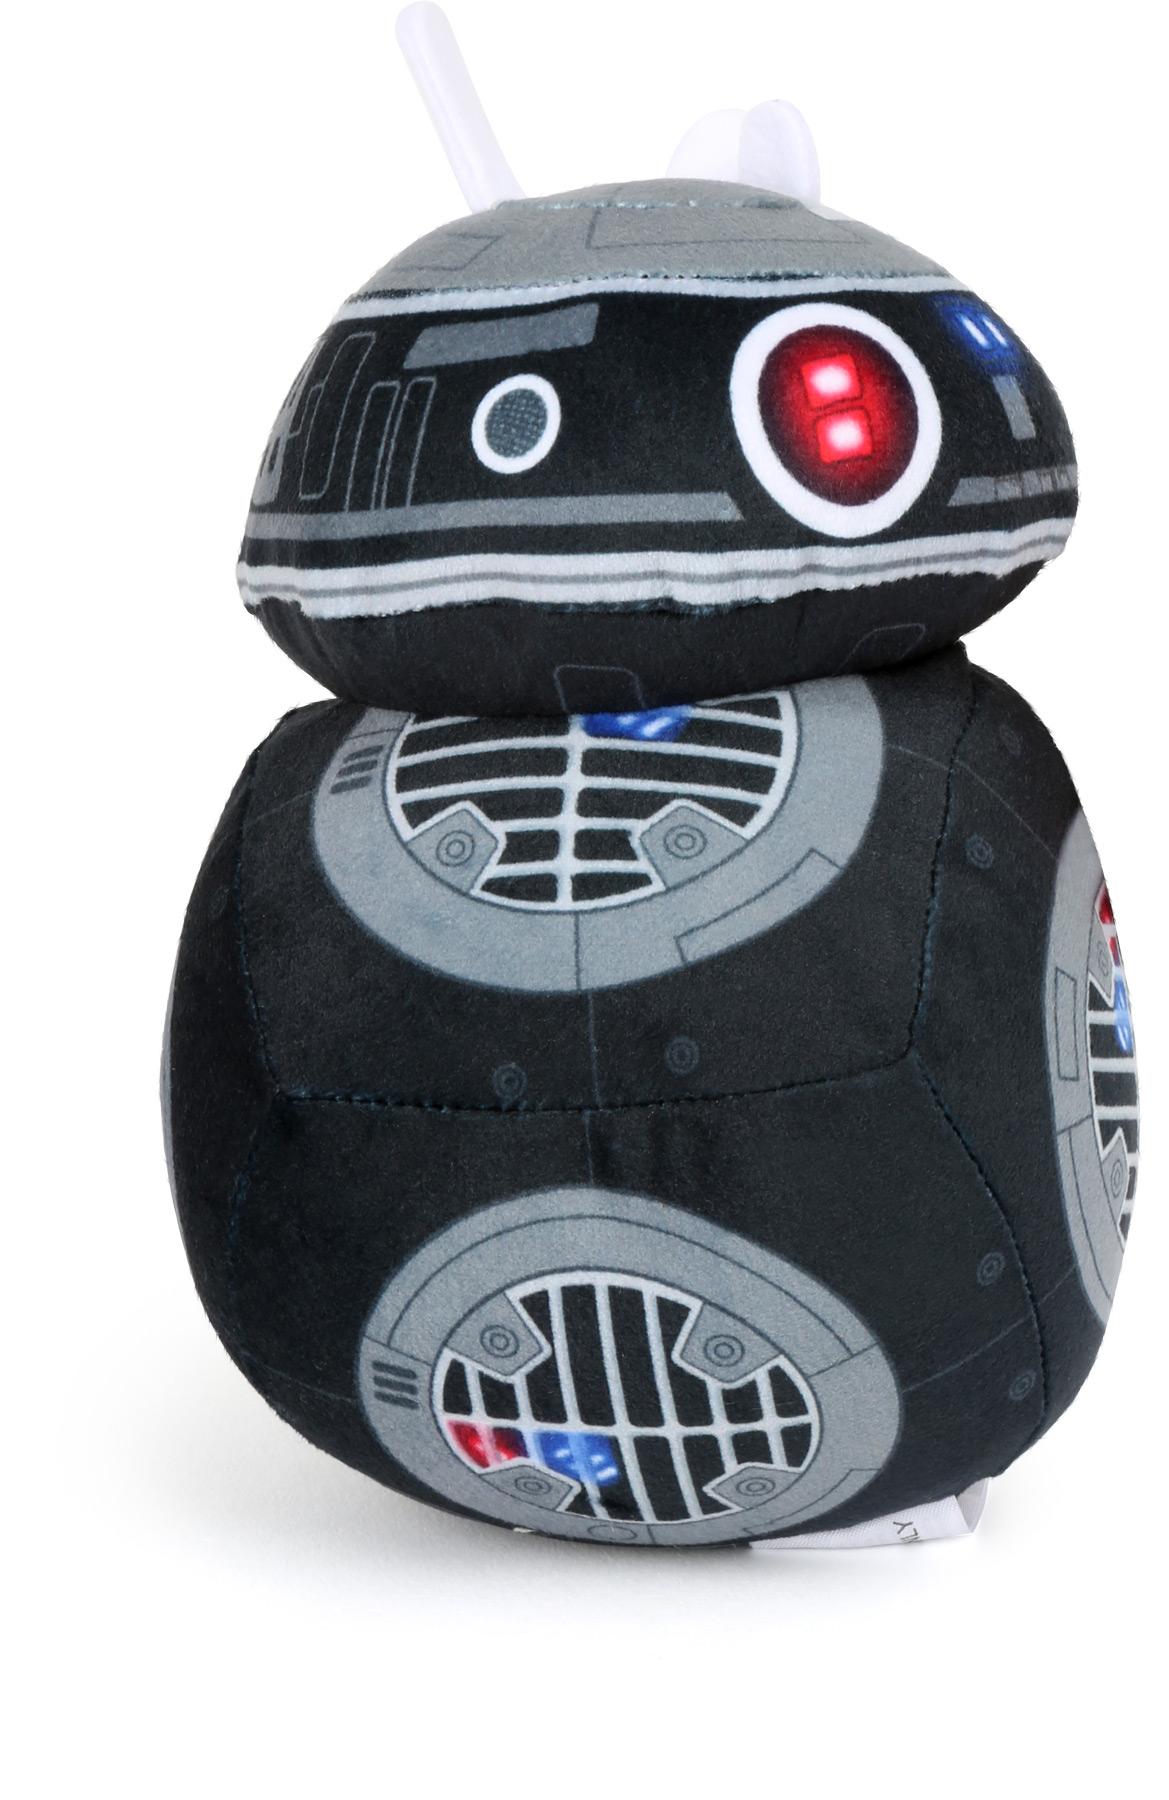 Small Foot Star Wars plyšový BB-9E